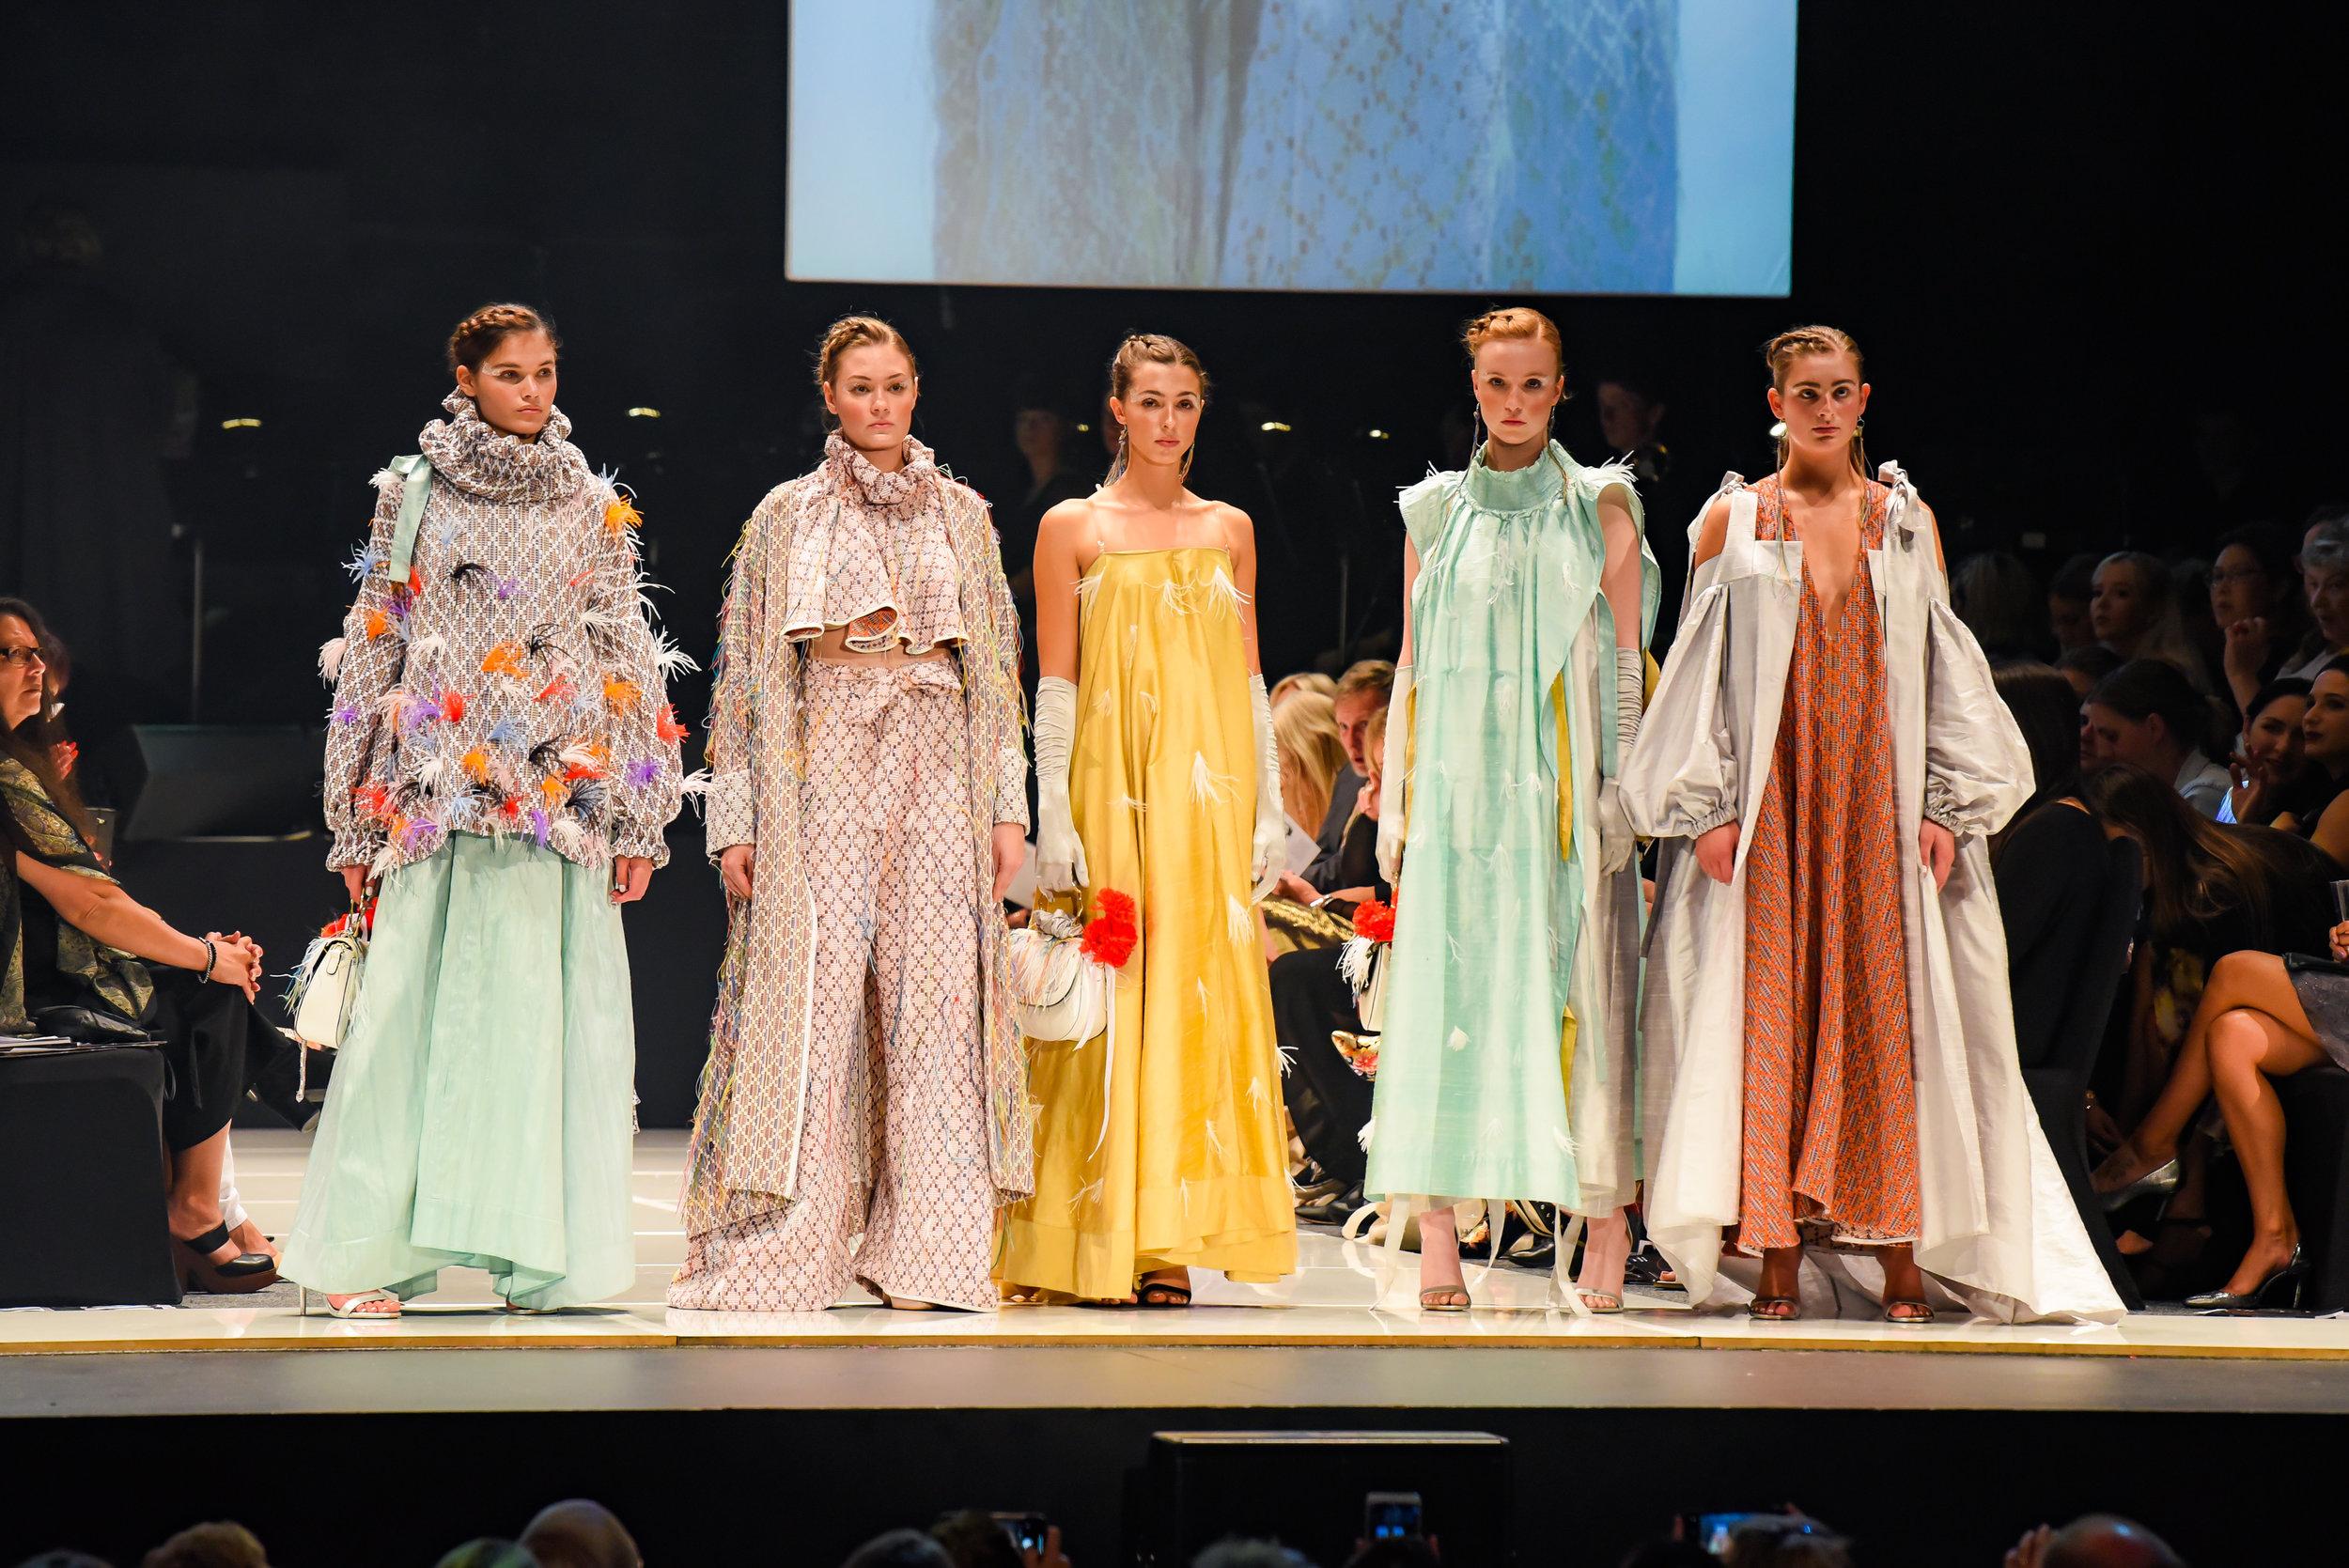 2019 iD International Emerging Designer Awards. Regent Theatre, Dunedin, New Zealand. Friday 15 March 2019. Photo: Chris Sullivan/iD Dunedin